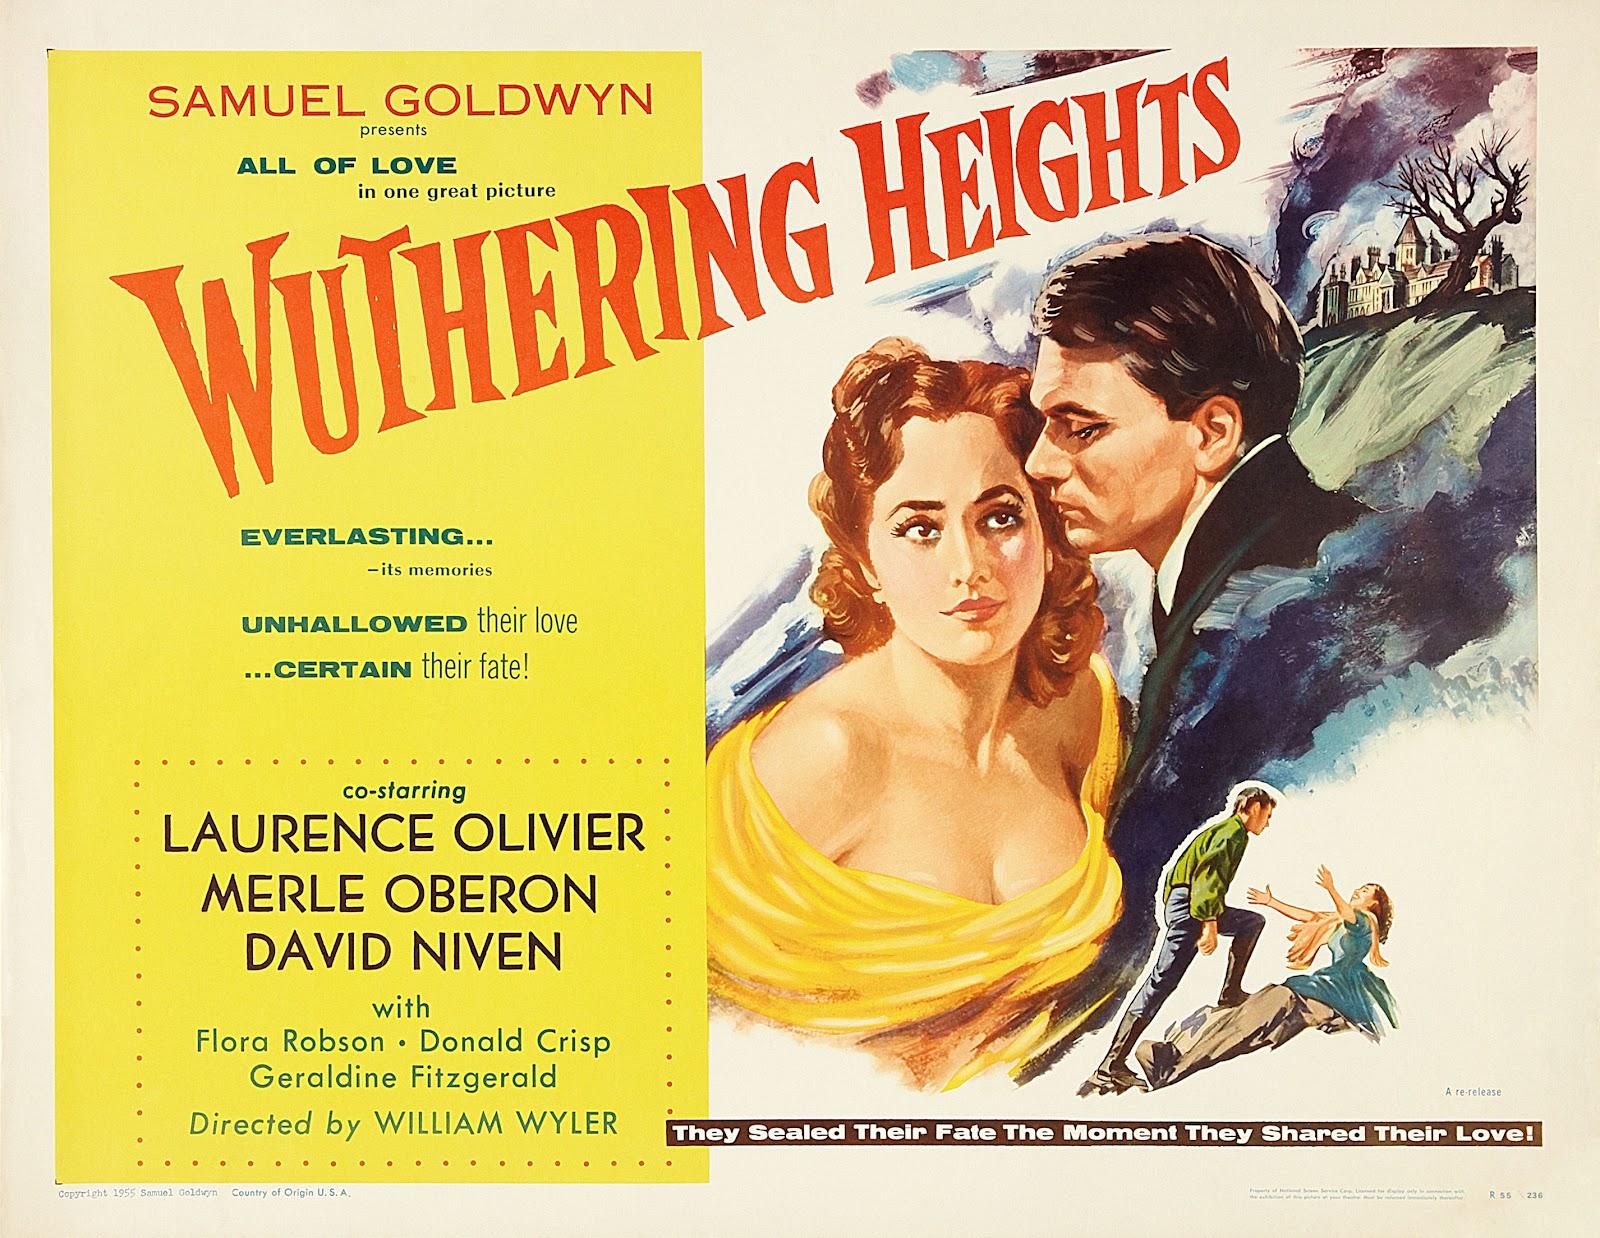 http://4.bp.blogspot.com/-gyiUSGw12Zs/T-WIz8enfyI/AAAAAAAADBQ/GuoawgWapFM/s1600/Poster+-+Wuthering+Heights+(1939)_02.jpg